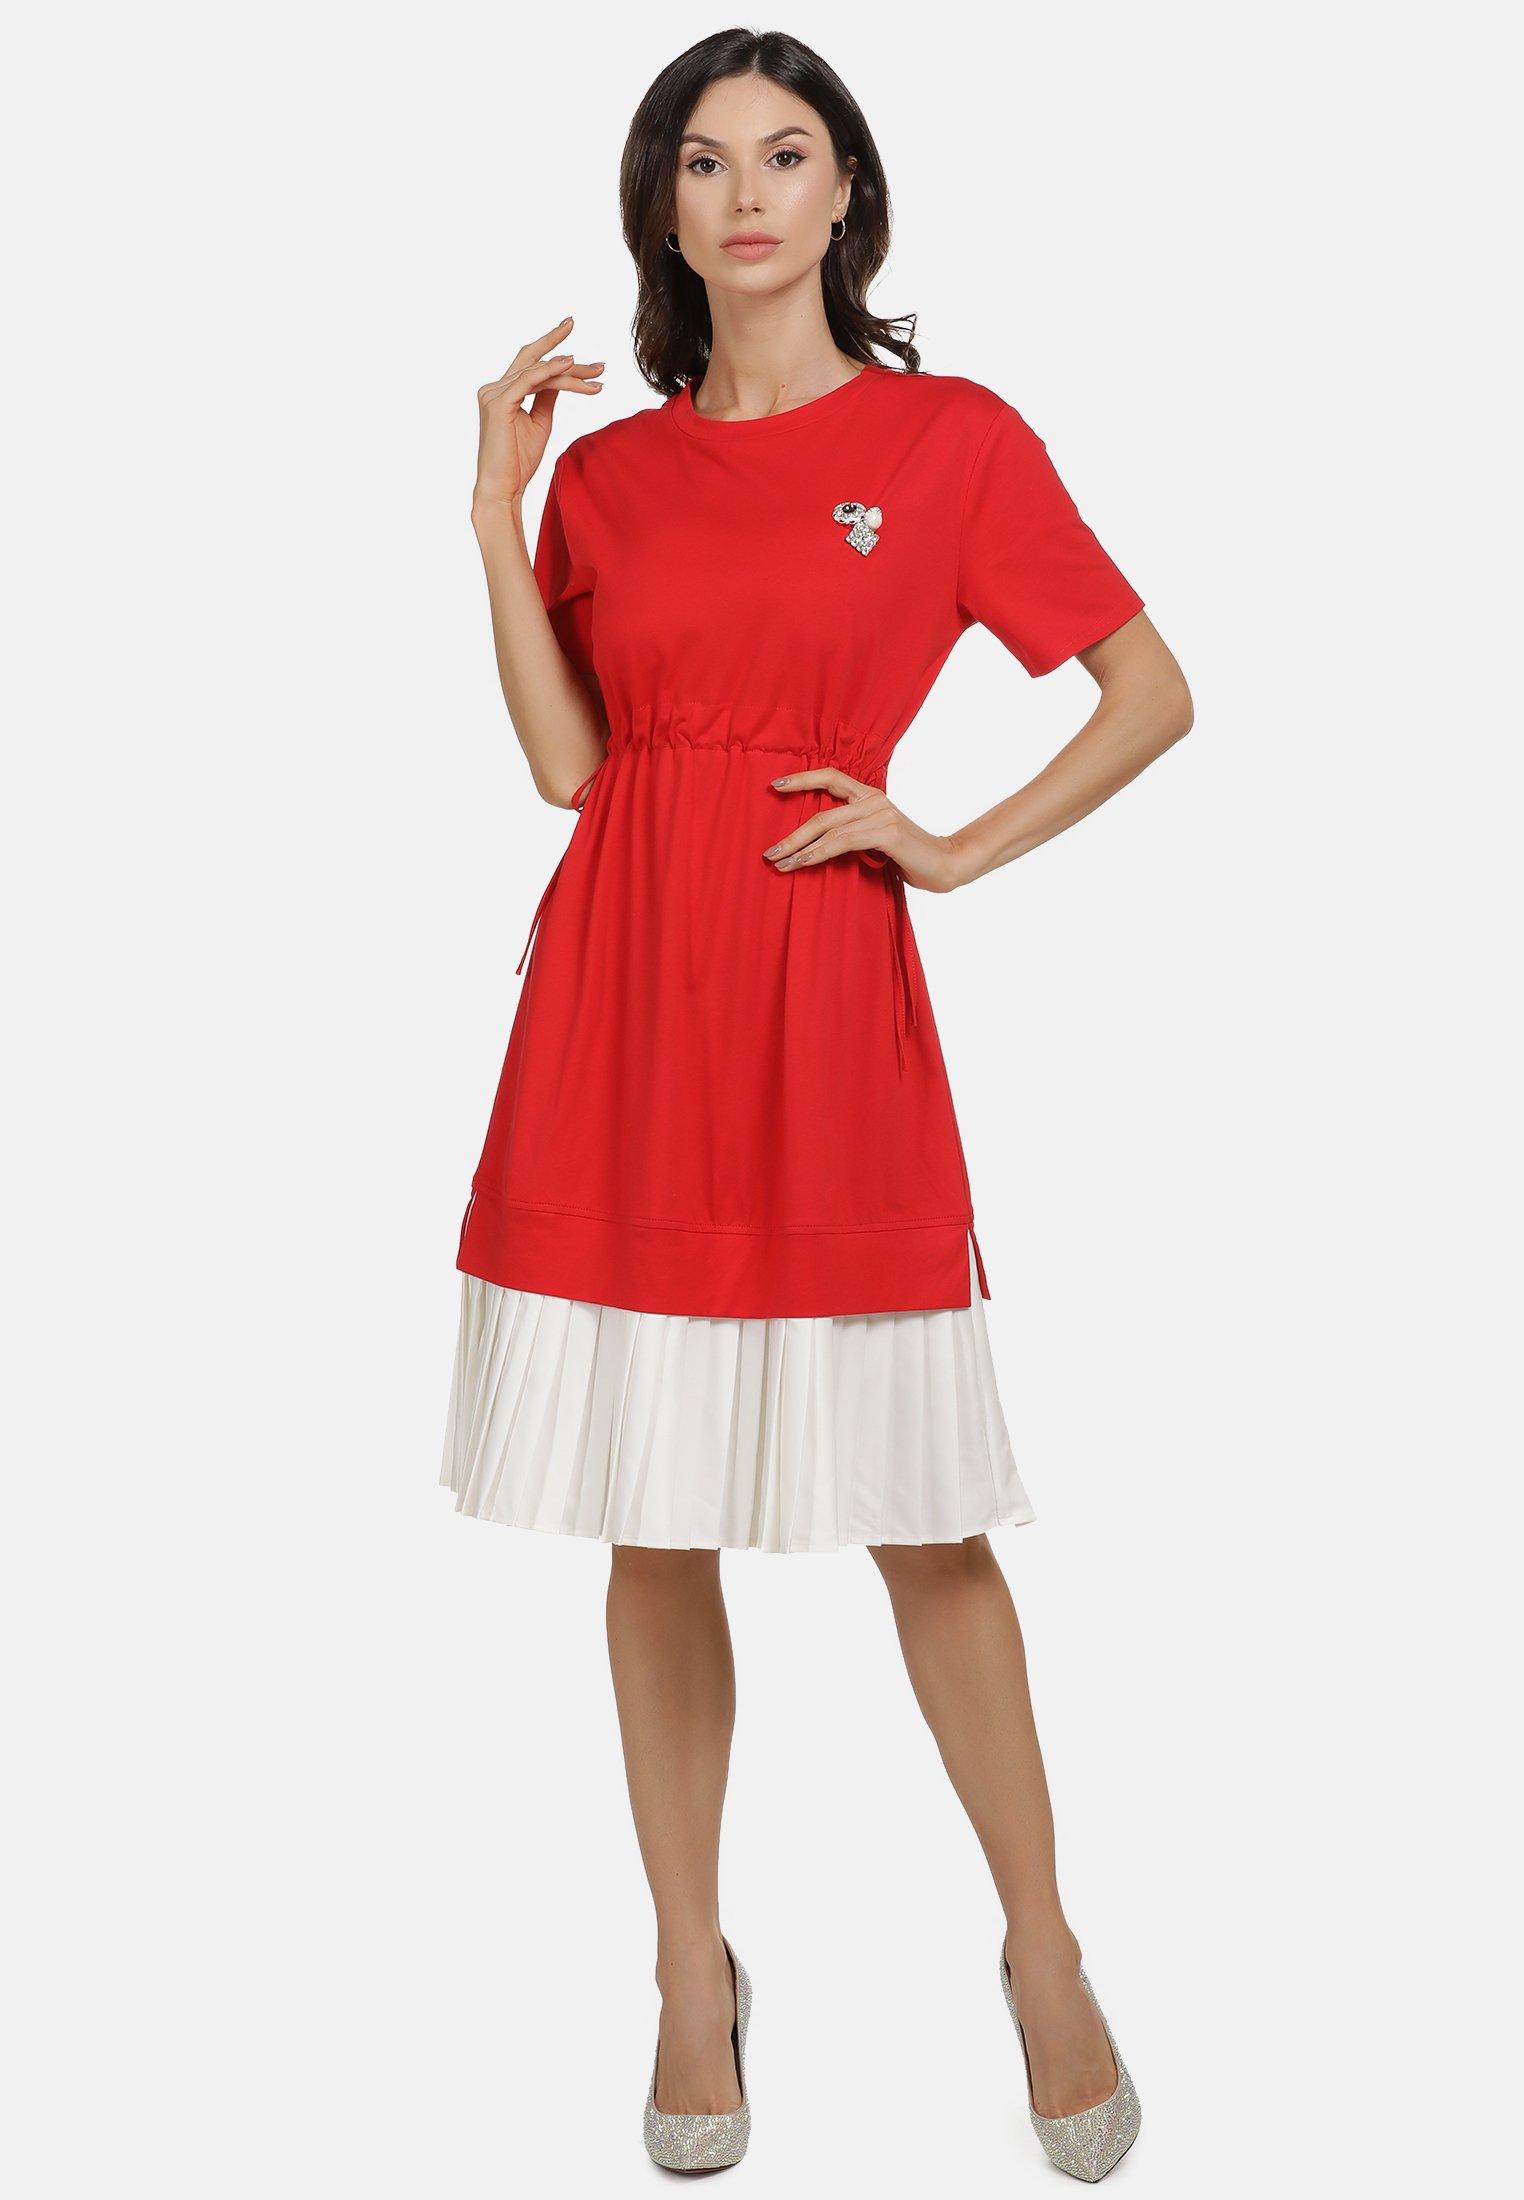 New Arrival Fashion Women's Clothing faina KLEID Day dress rot weiss d4lrZkRVr